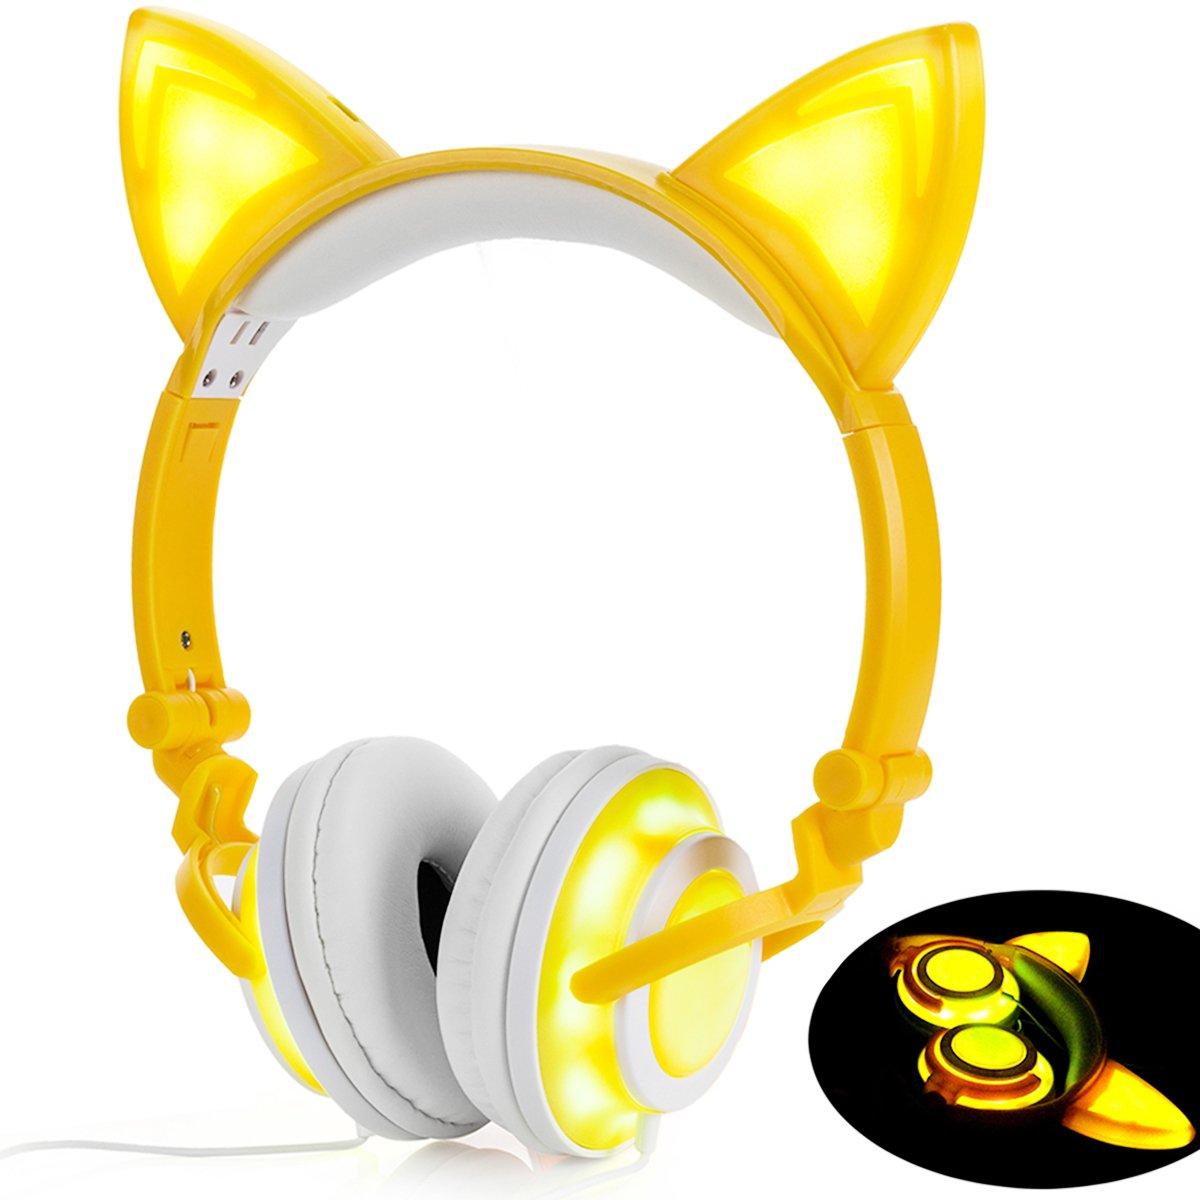 LIMSON Over-Ear-Headphones mit Katzenohr: Amazon.de: Elektronik